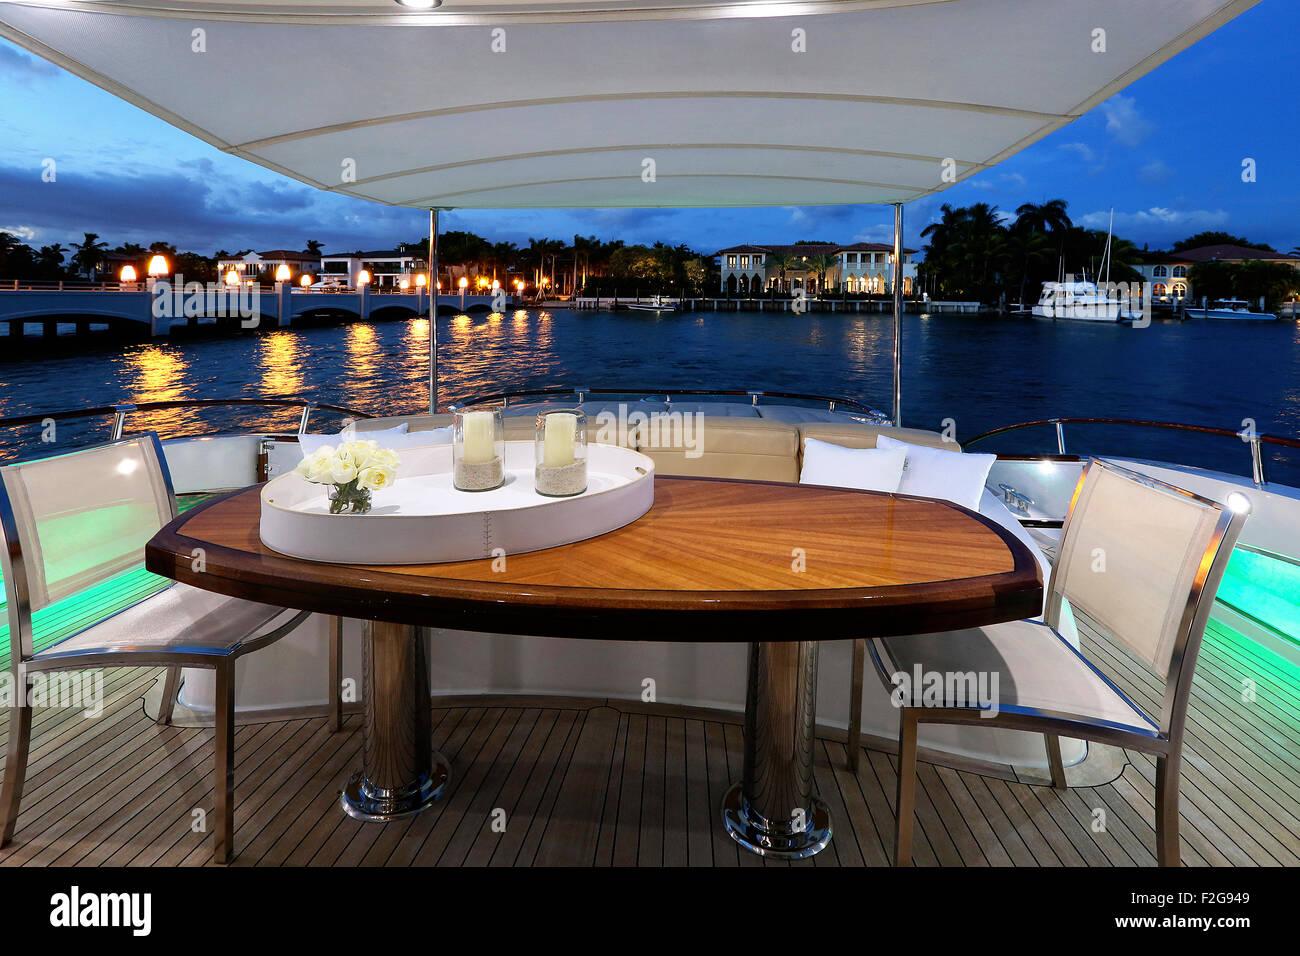 Outdoor dining area on luxury yacht - Stock Image